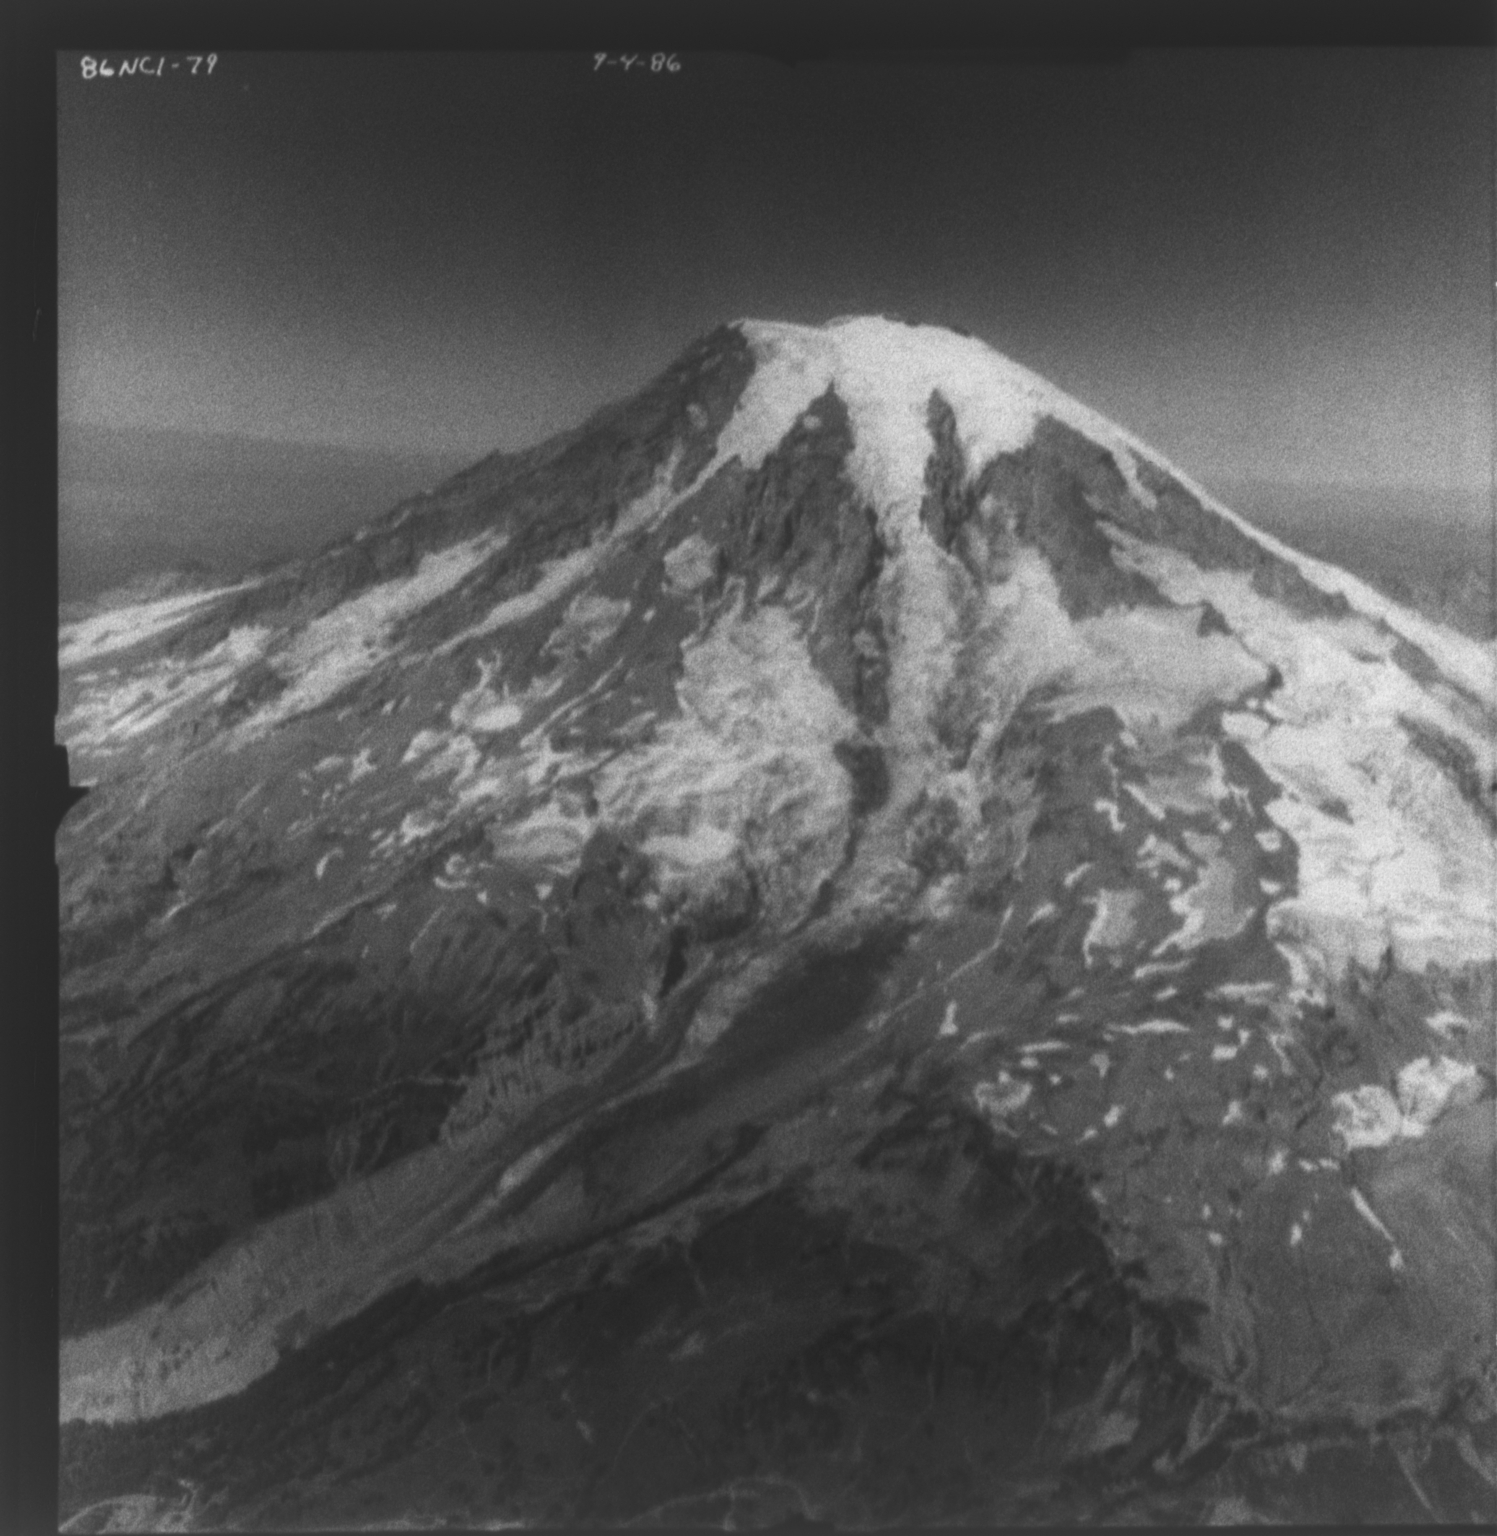 Nisqually Glacier, aerial photograph FL 86NC1, Washington, United States